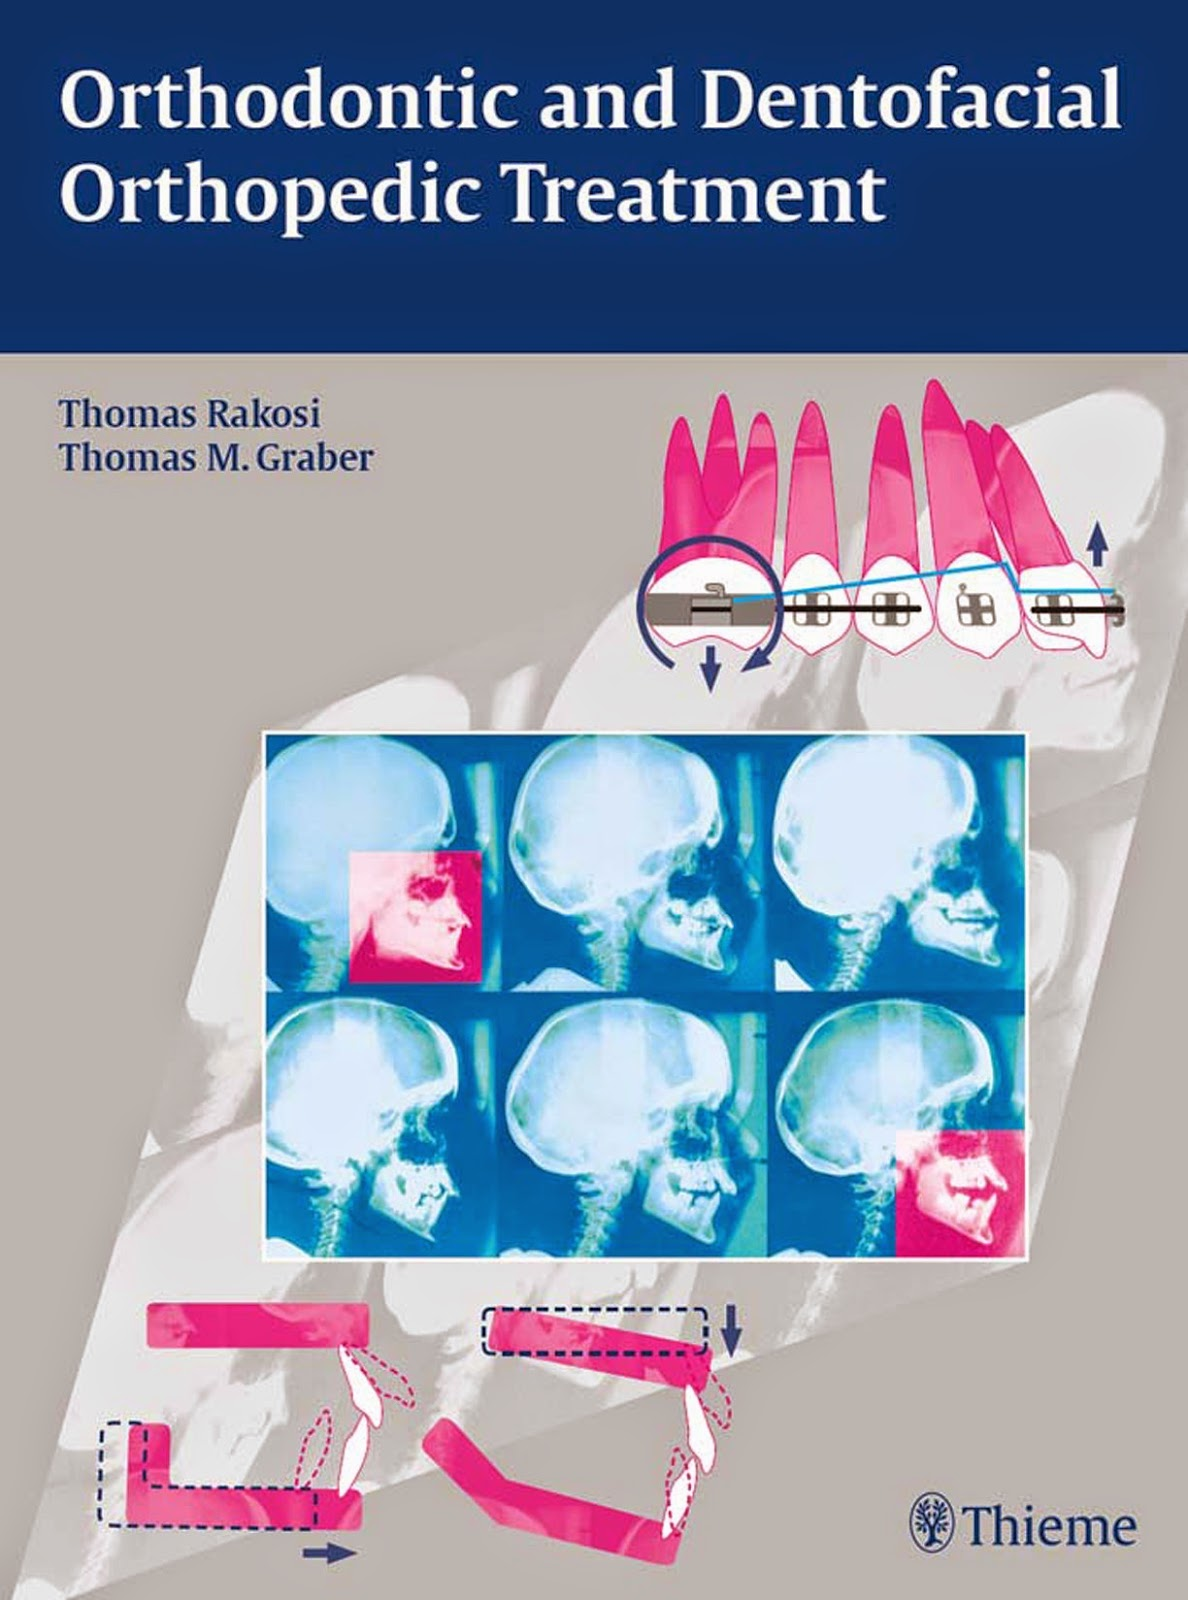 Orthodontic and Dentofacial Orthopedic Treatment - Thomas Rakosi,Thomas M. Graber- © 2010.PDF